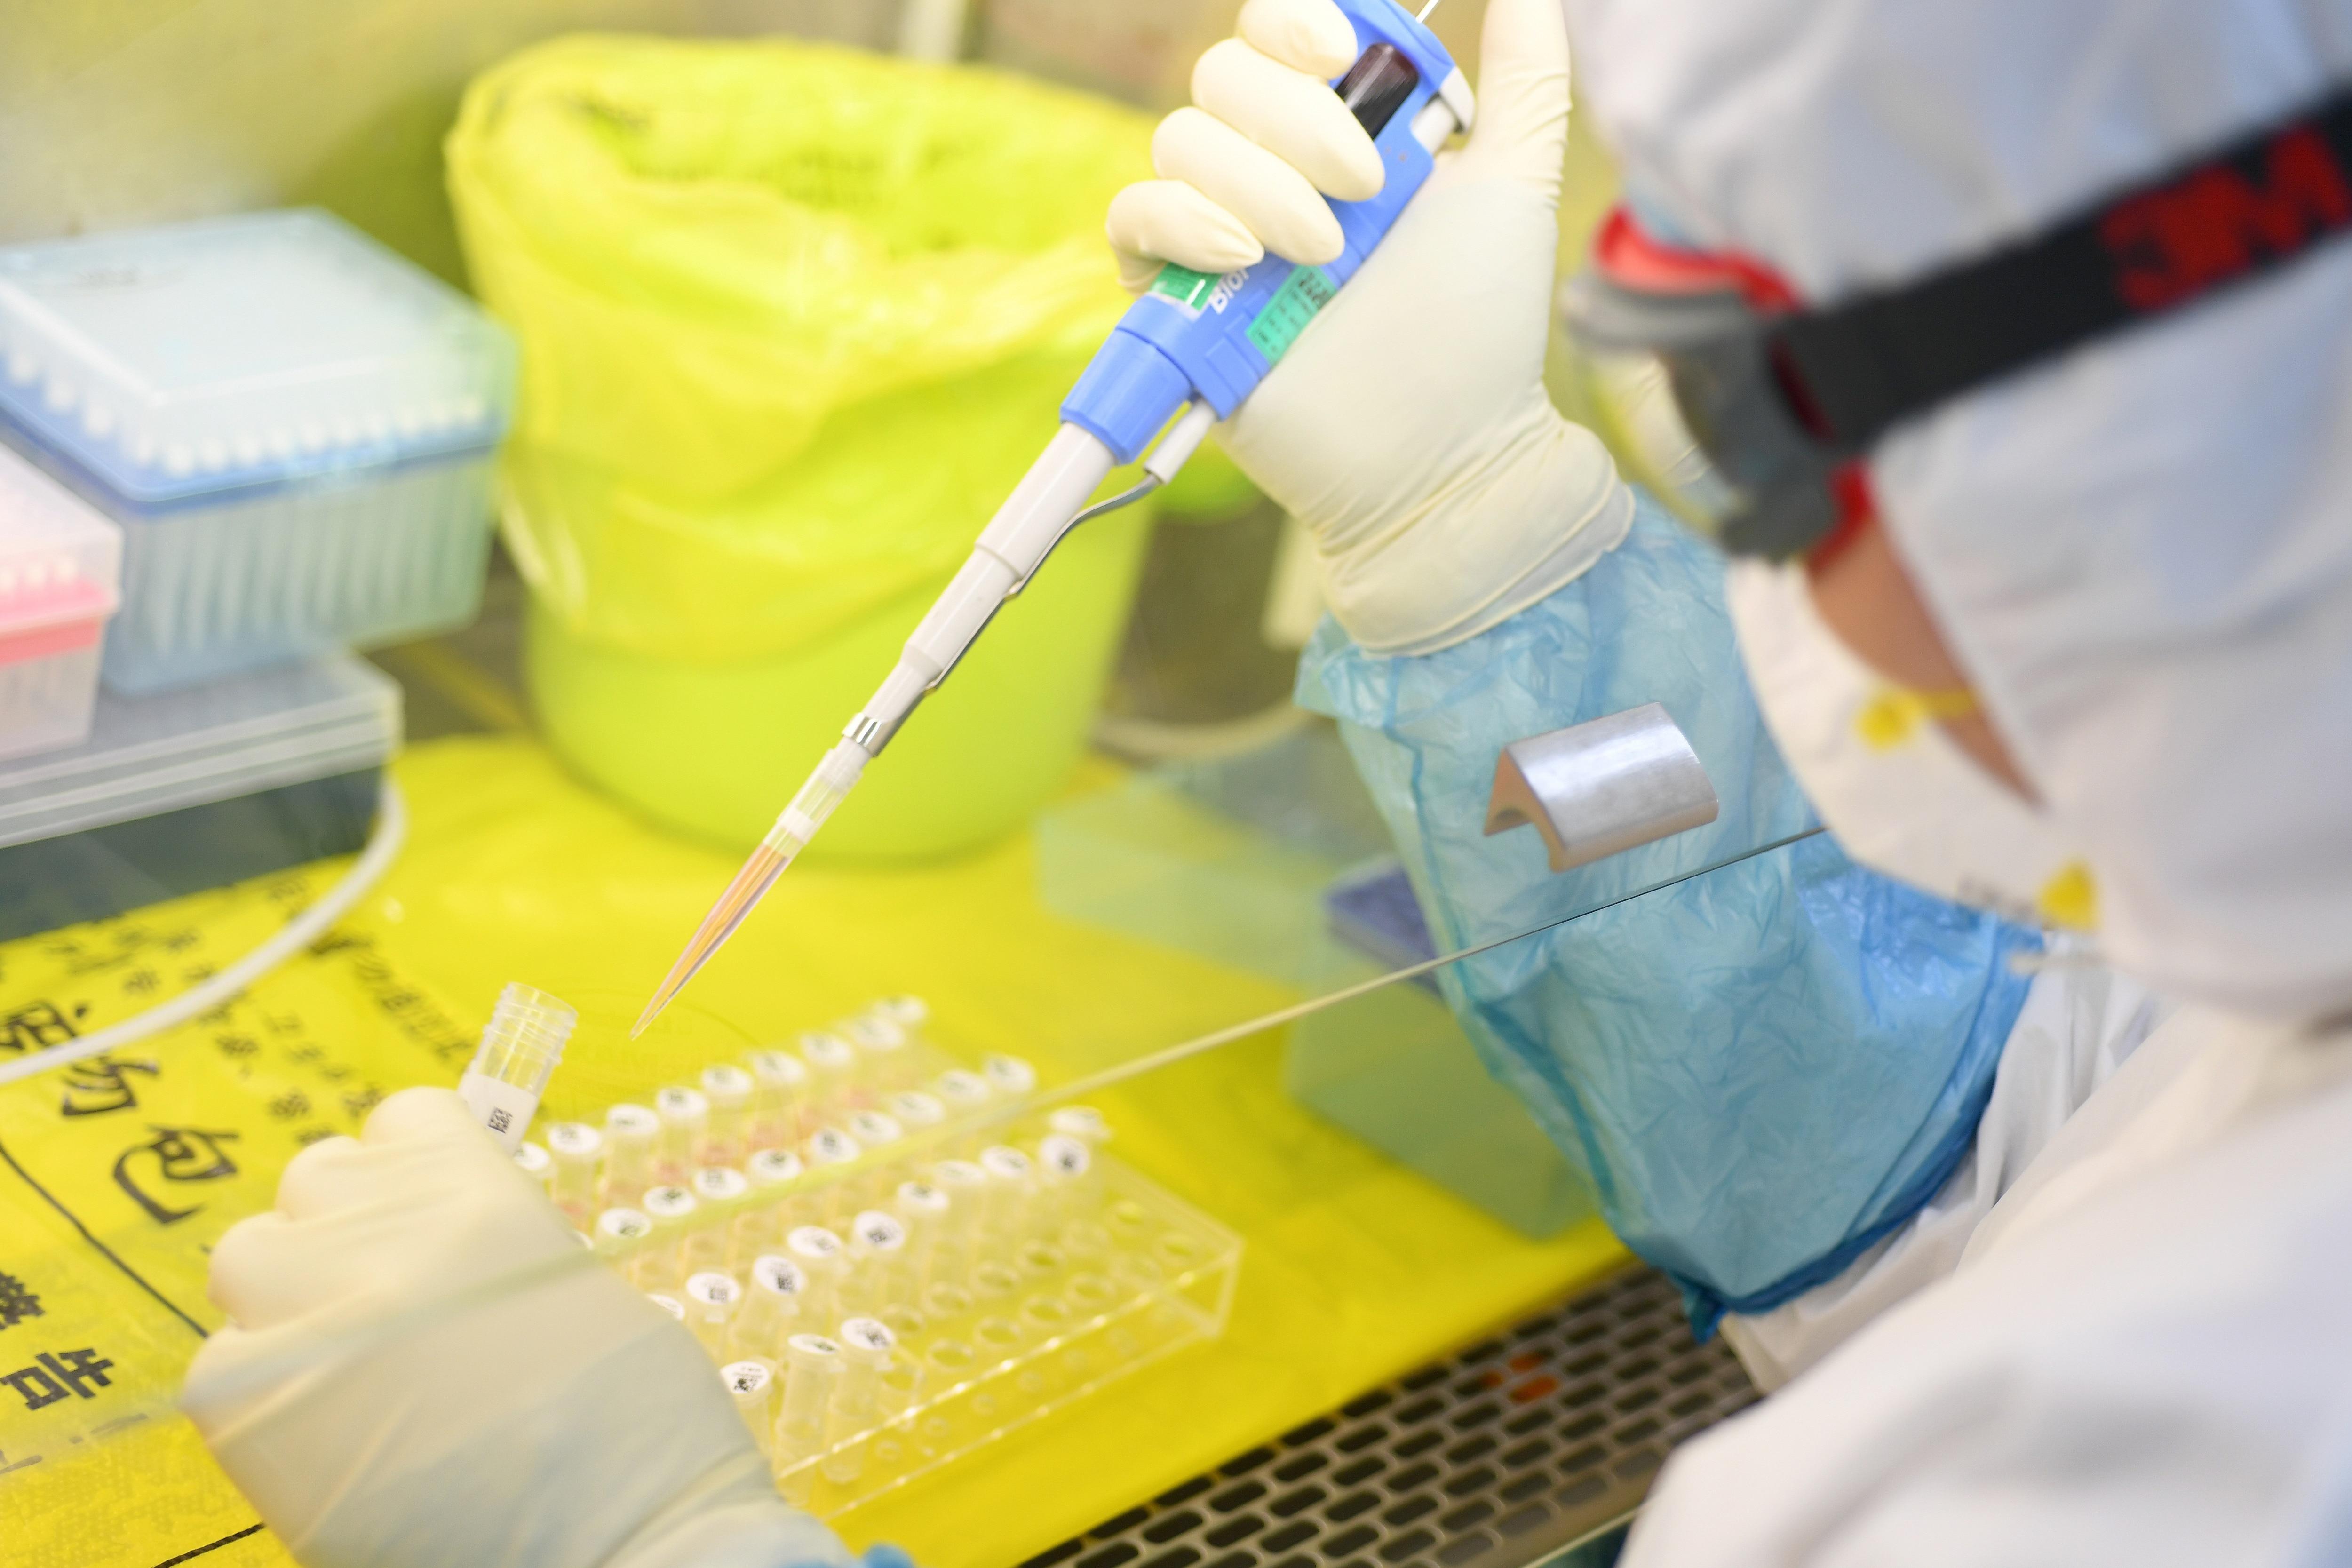 Actriz Porno Qu Studio Bioquimica un documental sobre el origen del coronavirus asegura que el